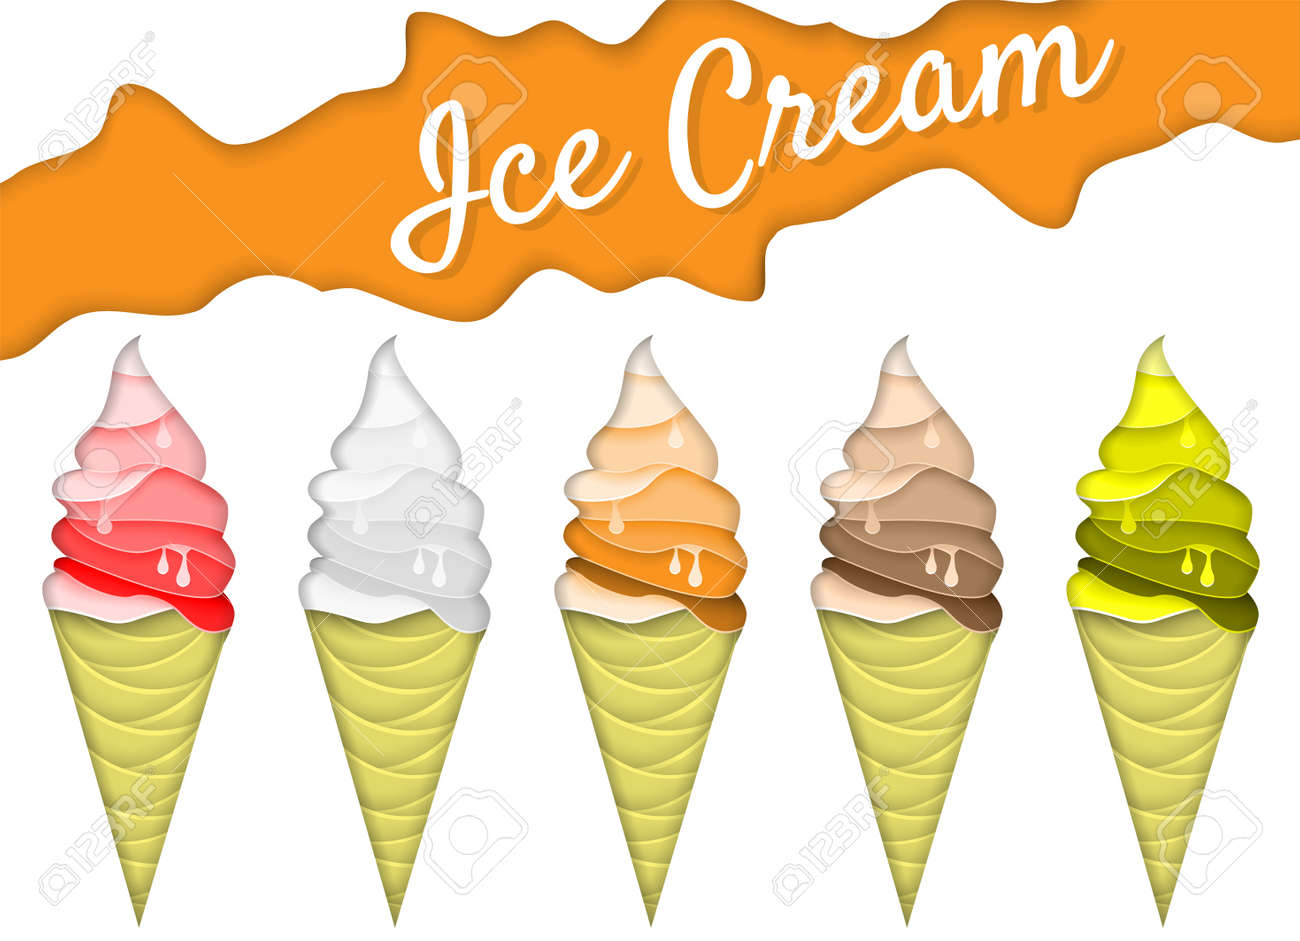 Ice cream cone icon set vector illustration in paper art style ice cream cone icon set vector illustration in paper art style origami melting ice maxwellsz